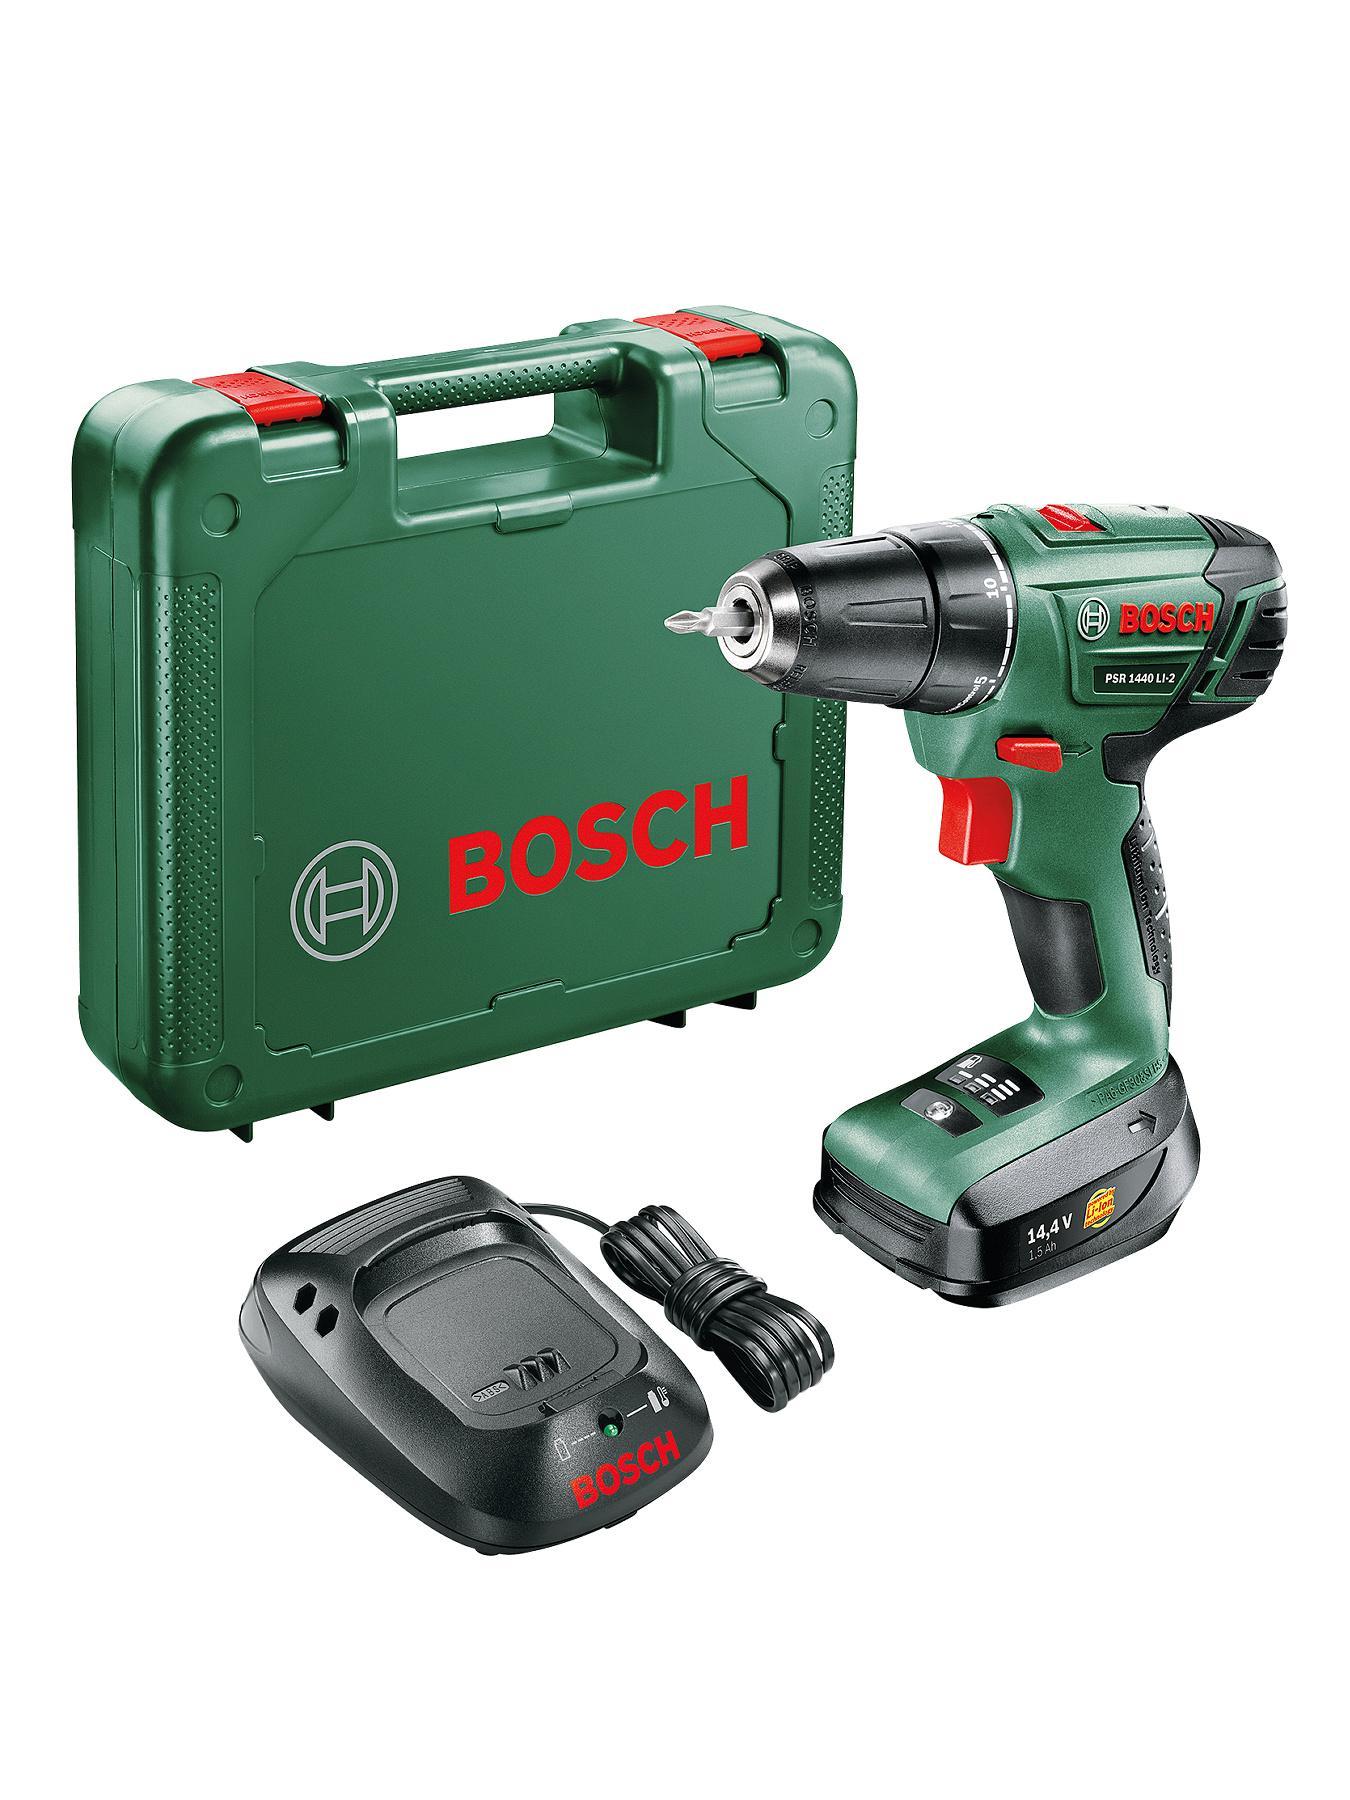 Bosch PSR 1440 LI-2 Lithium ION Drill Driver